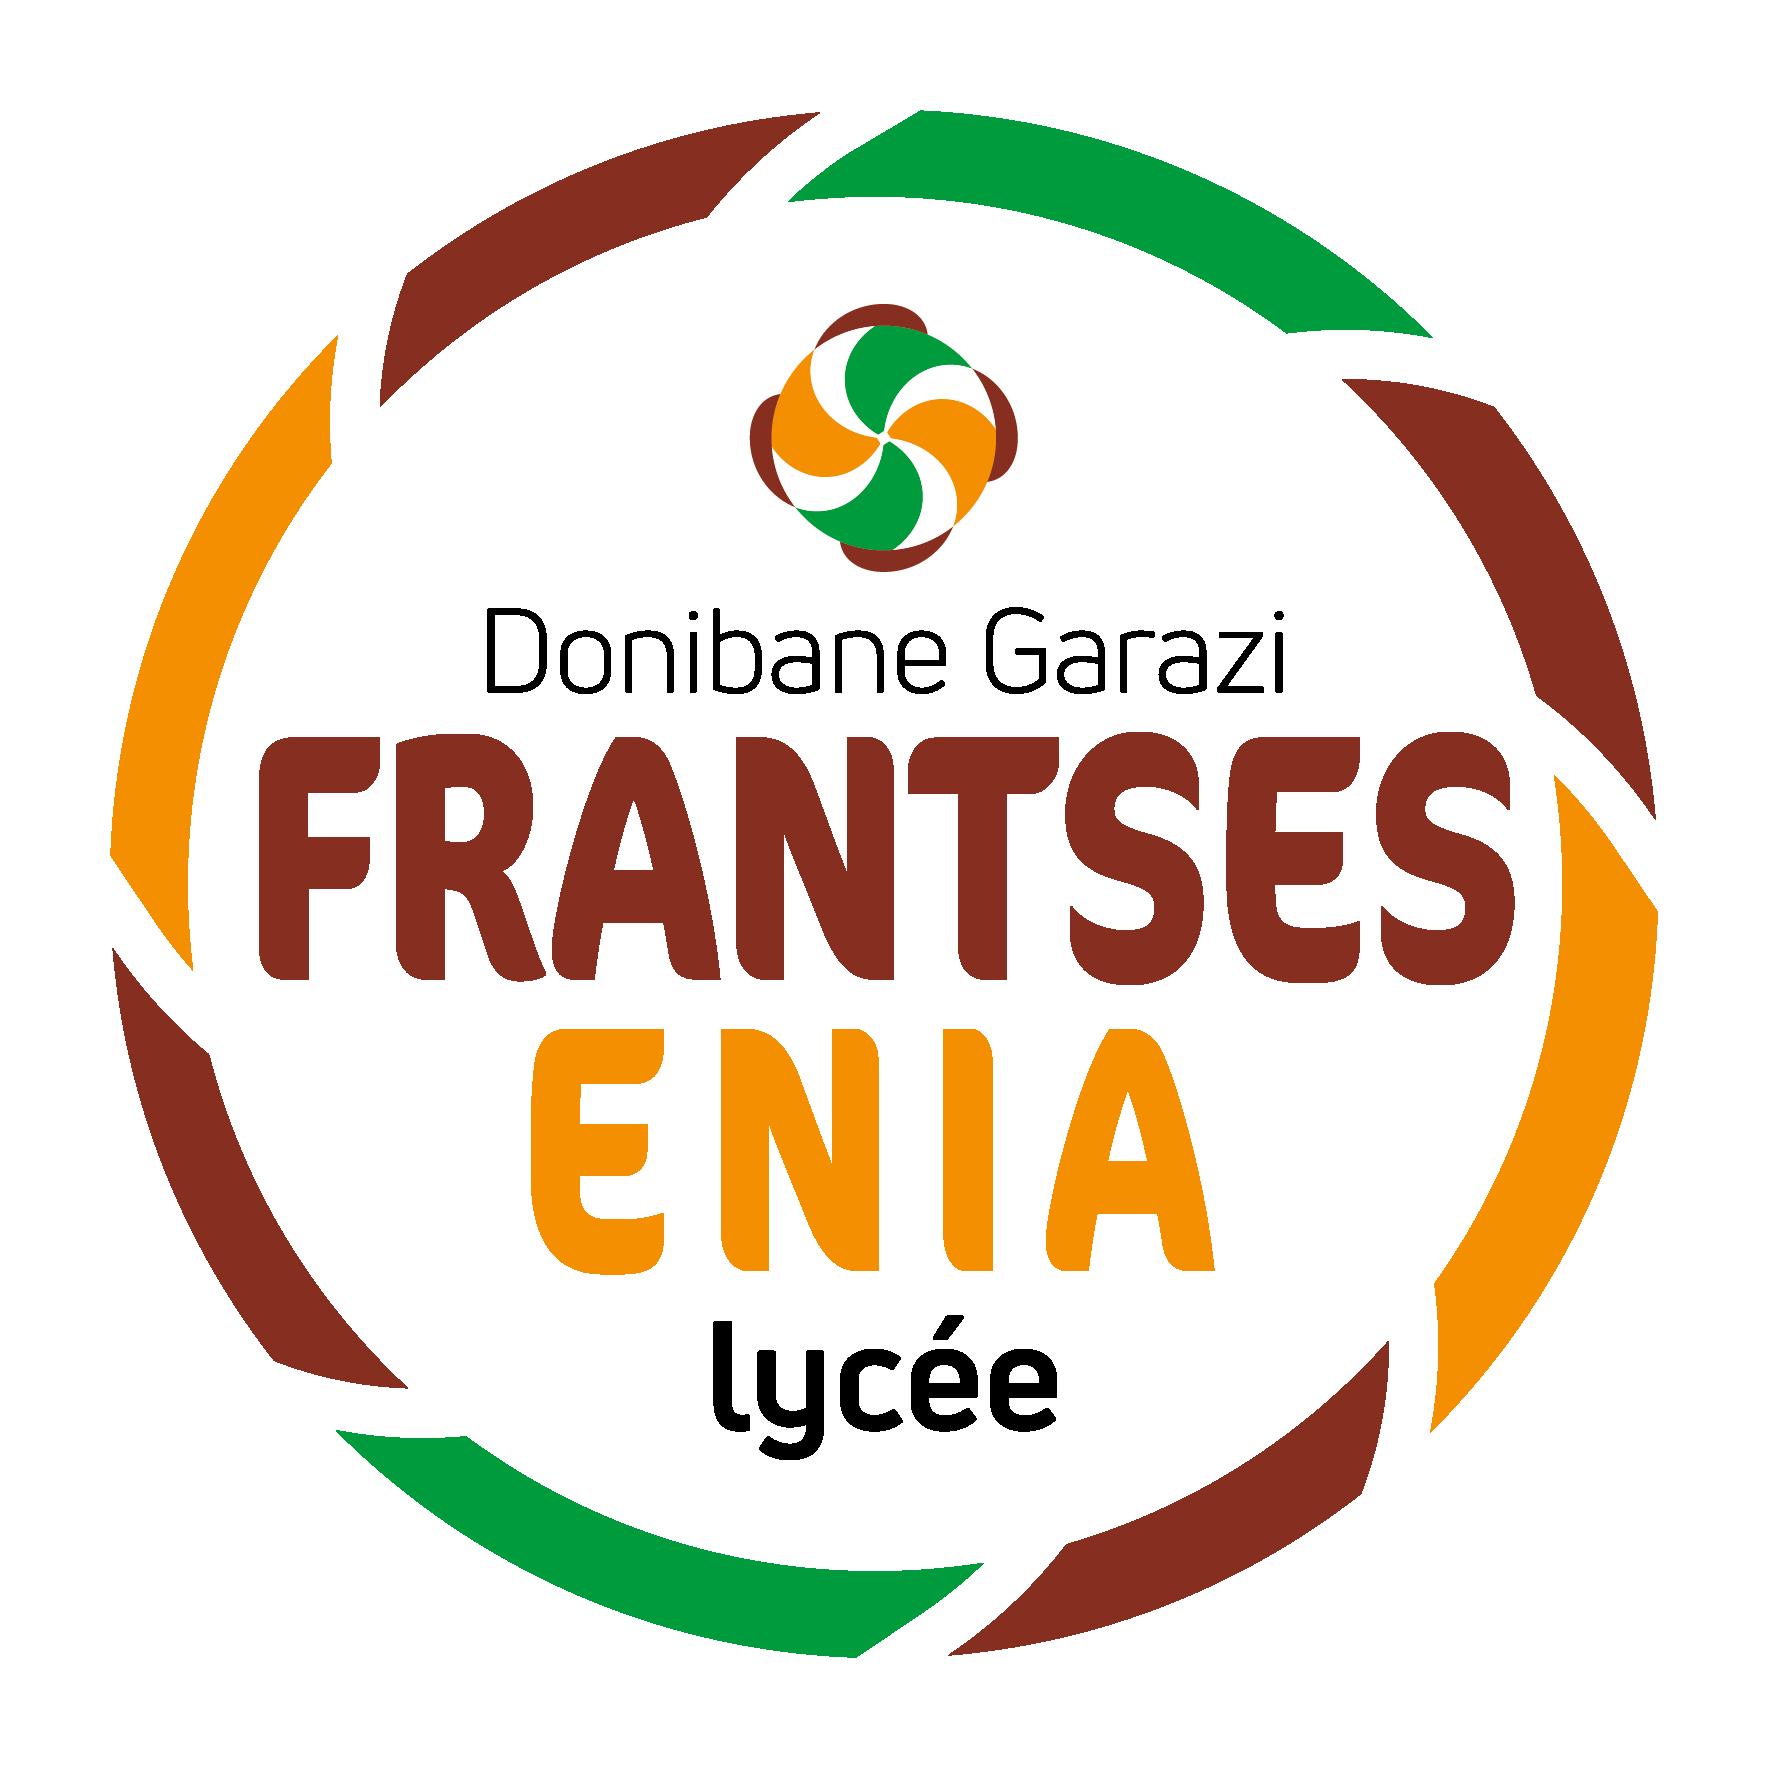 LYCÉE FRANTSESENIA - Enseignement professionnel